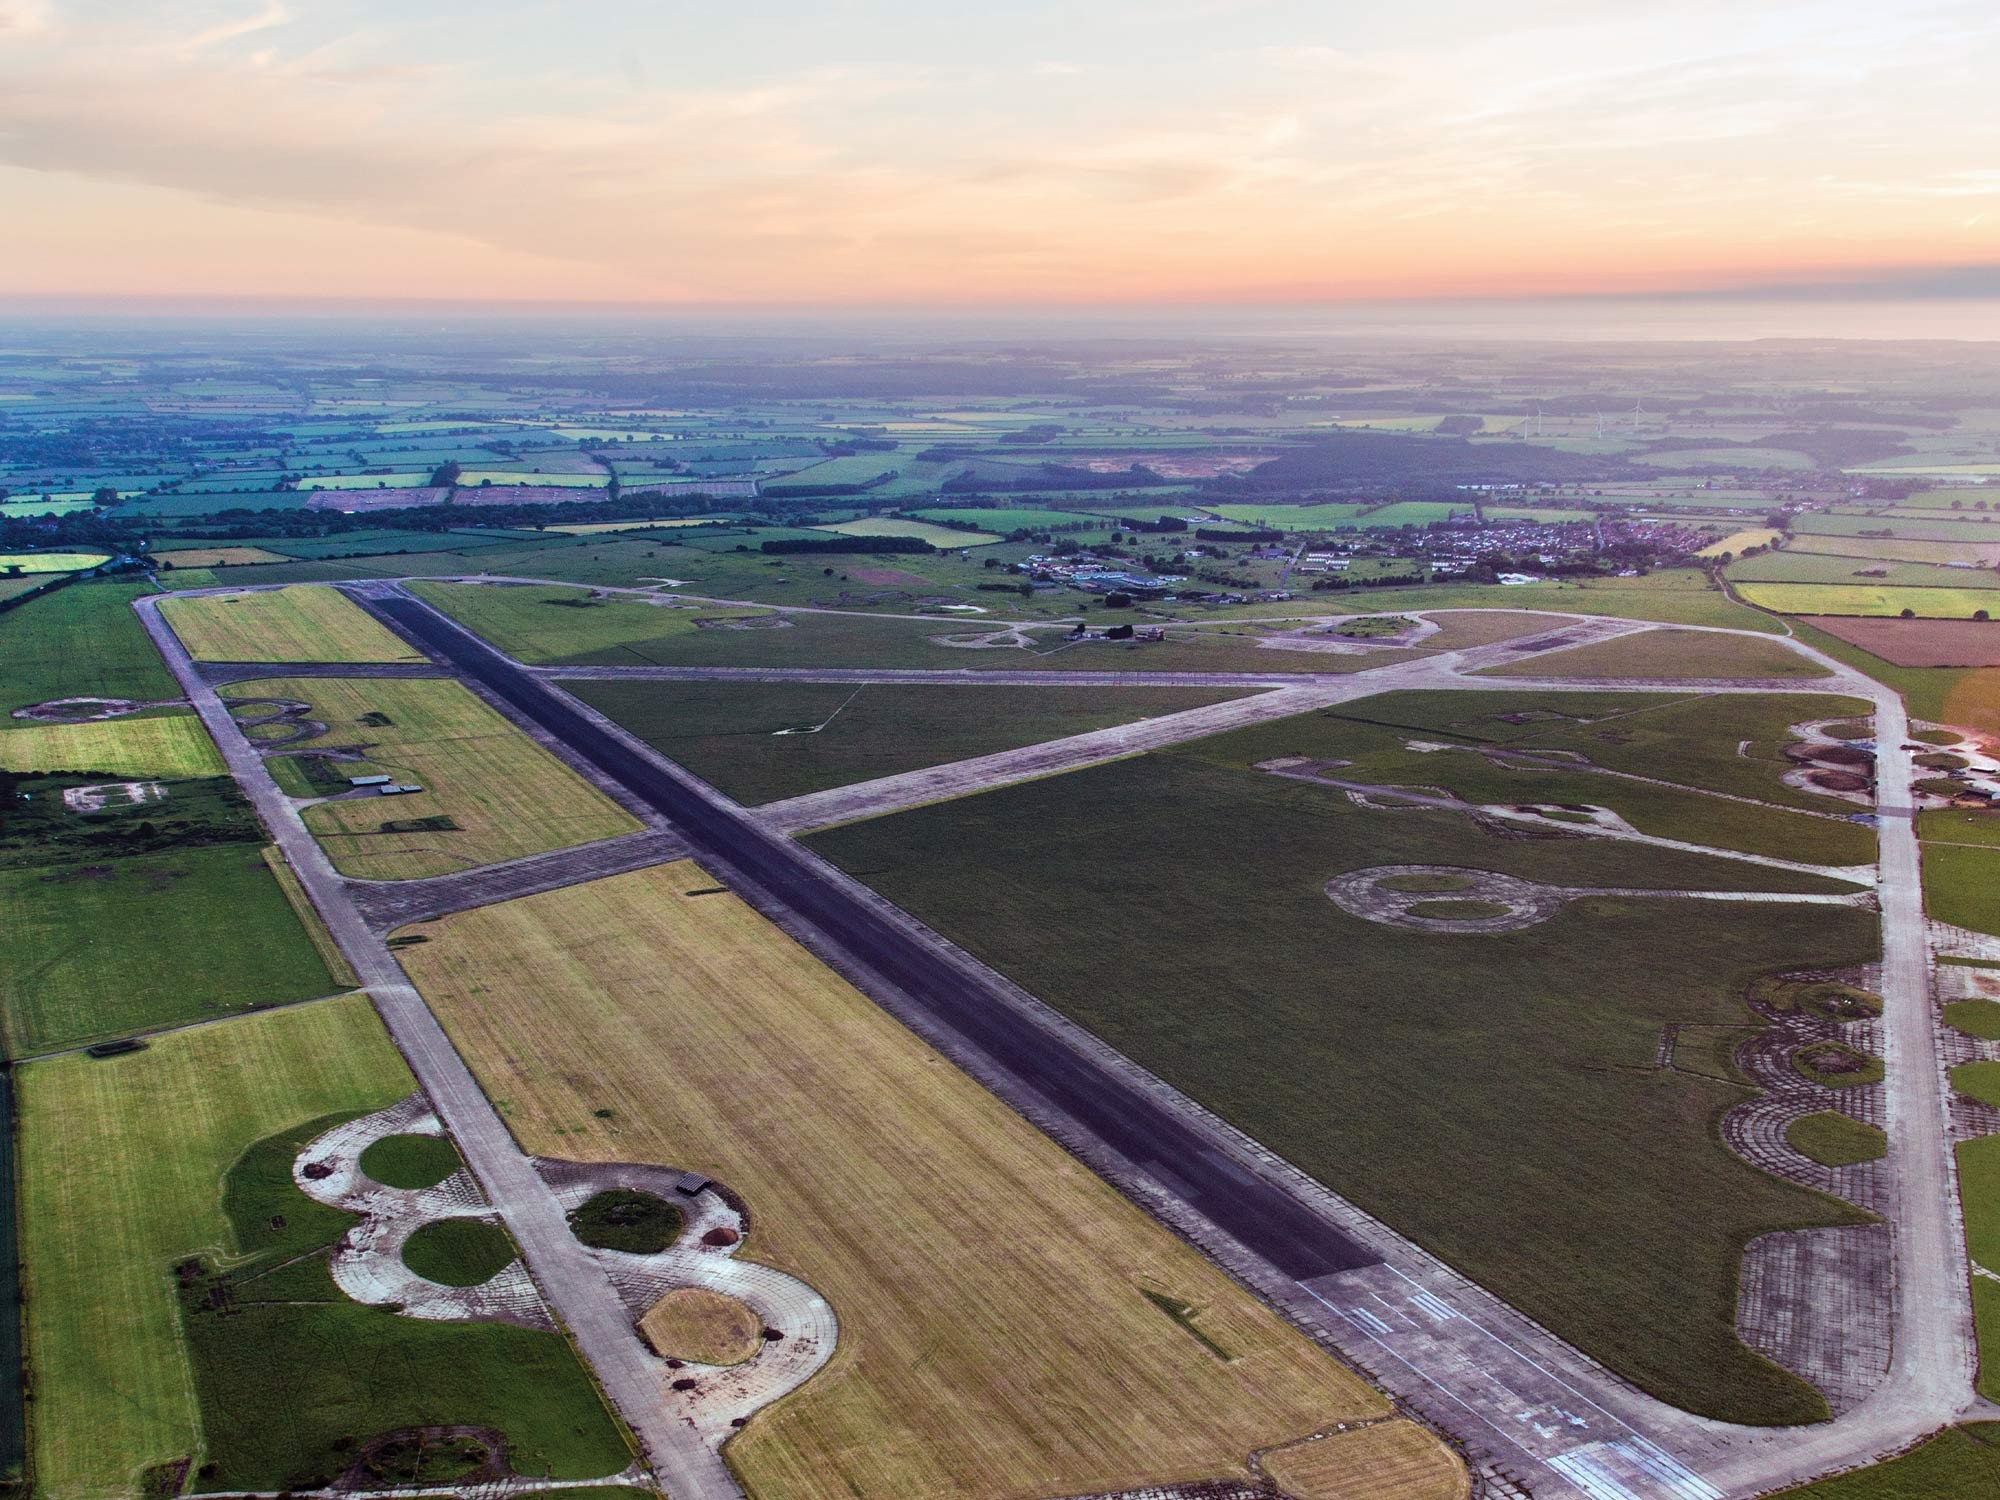 RAF Sculthorpe aerial view